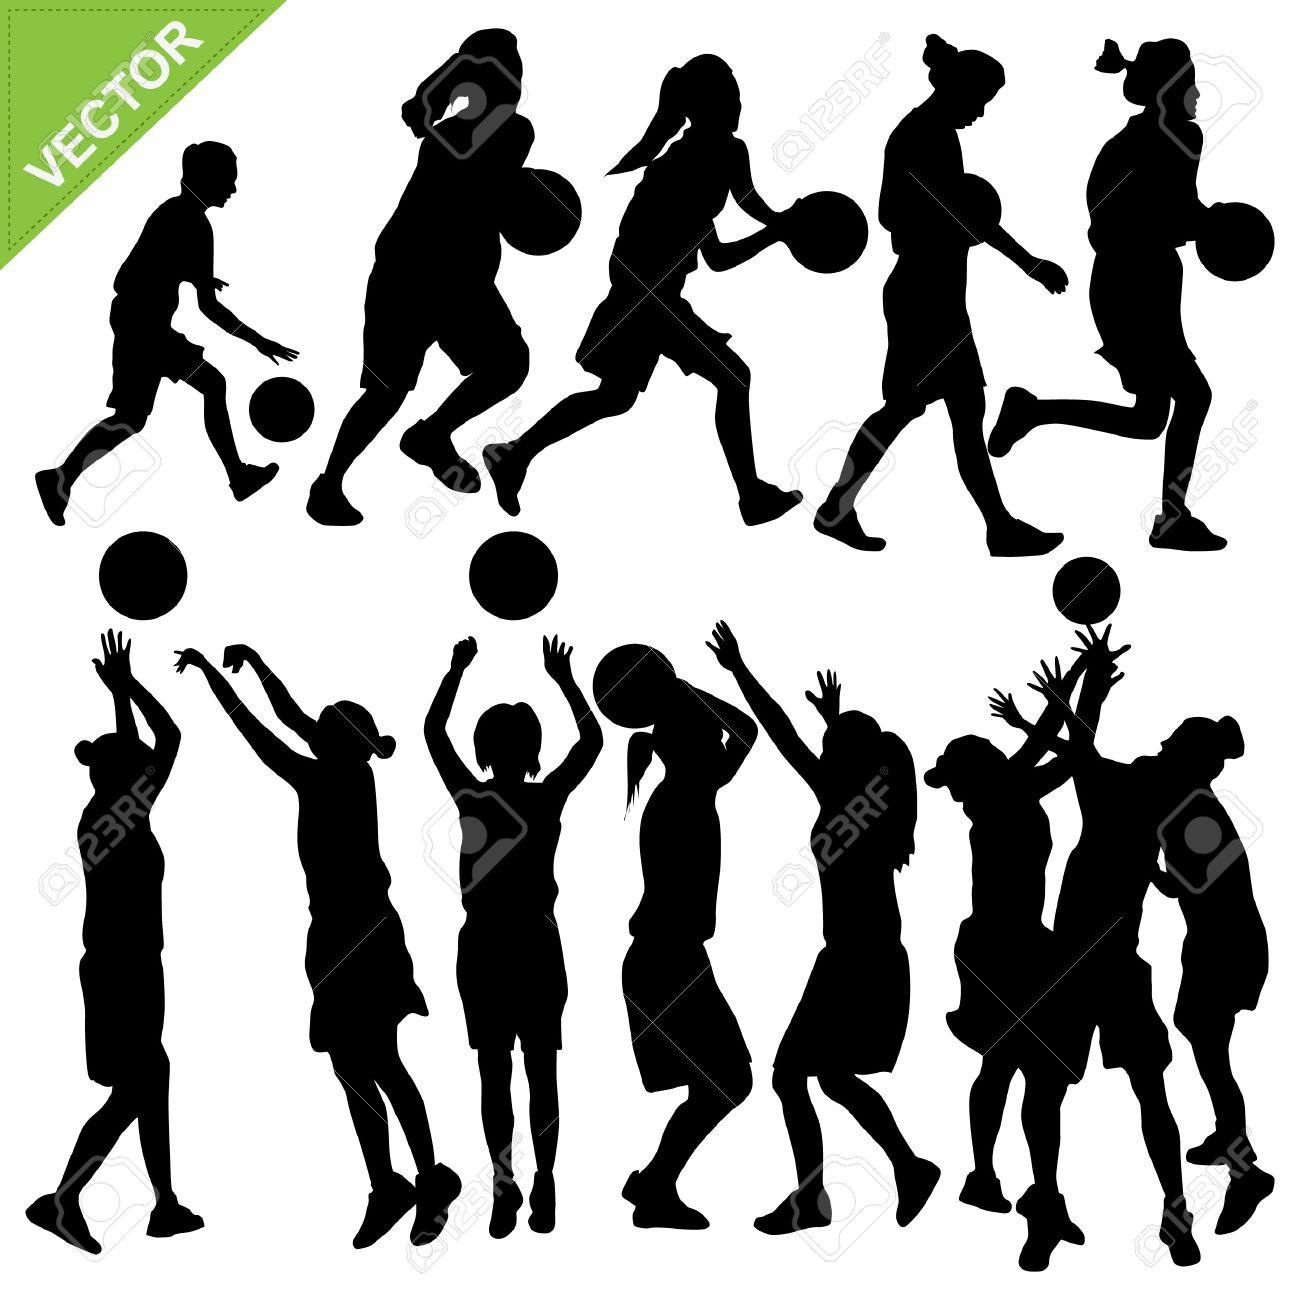 Women play basketball silhouettes Stock Vector - 17699642